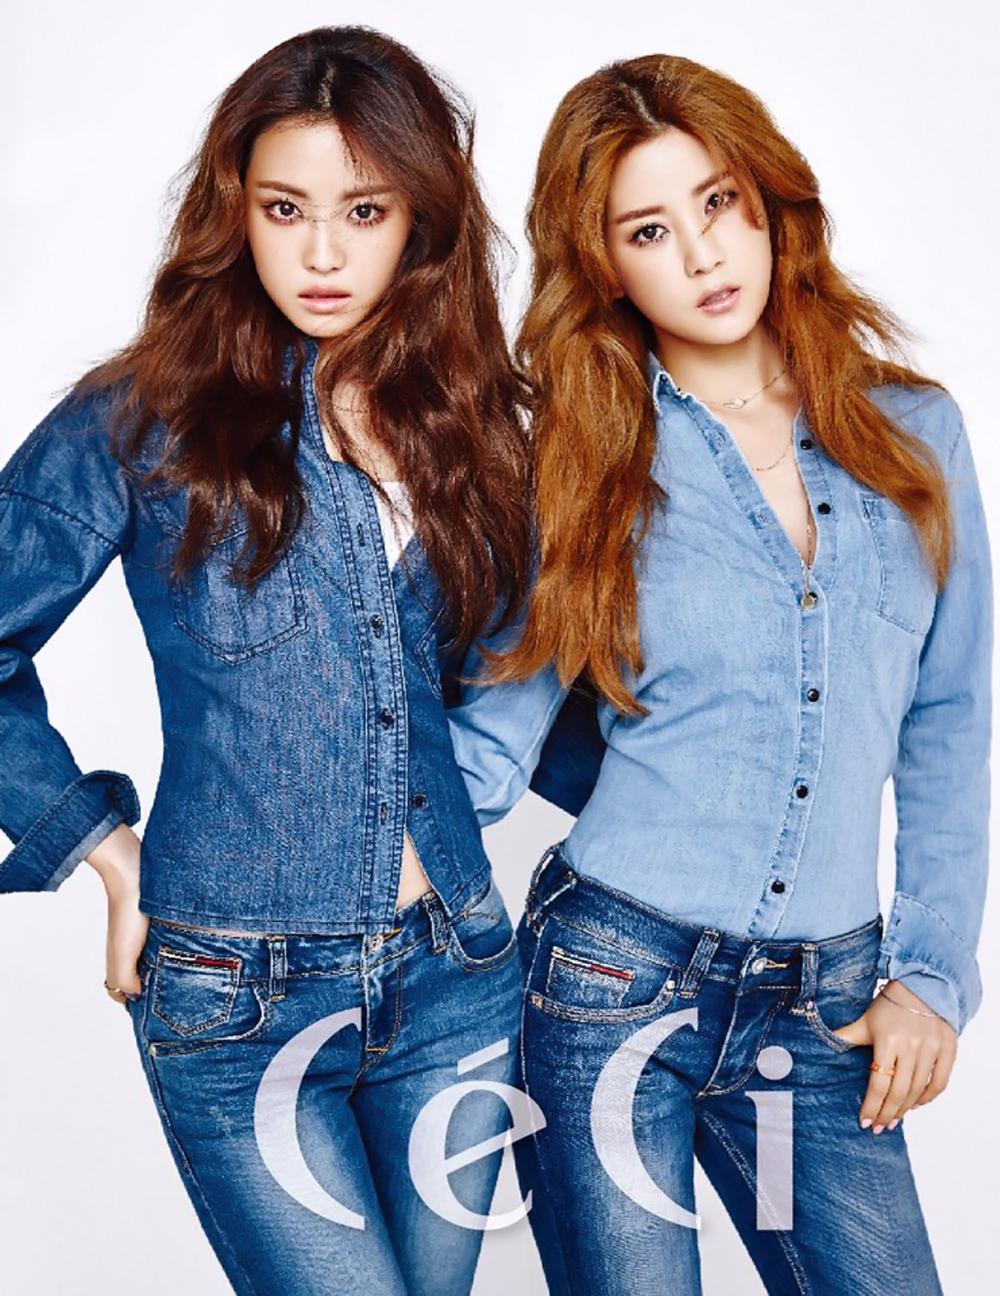 Naeun y Chorong de A Pink lucen un estilo denim para la revista CeCi